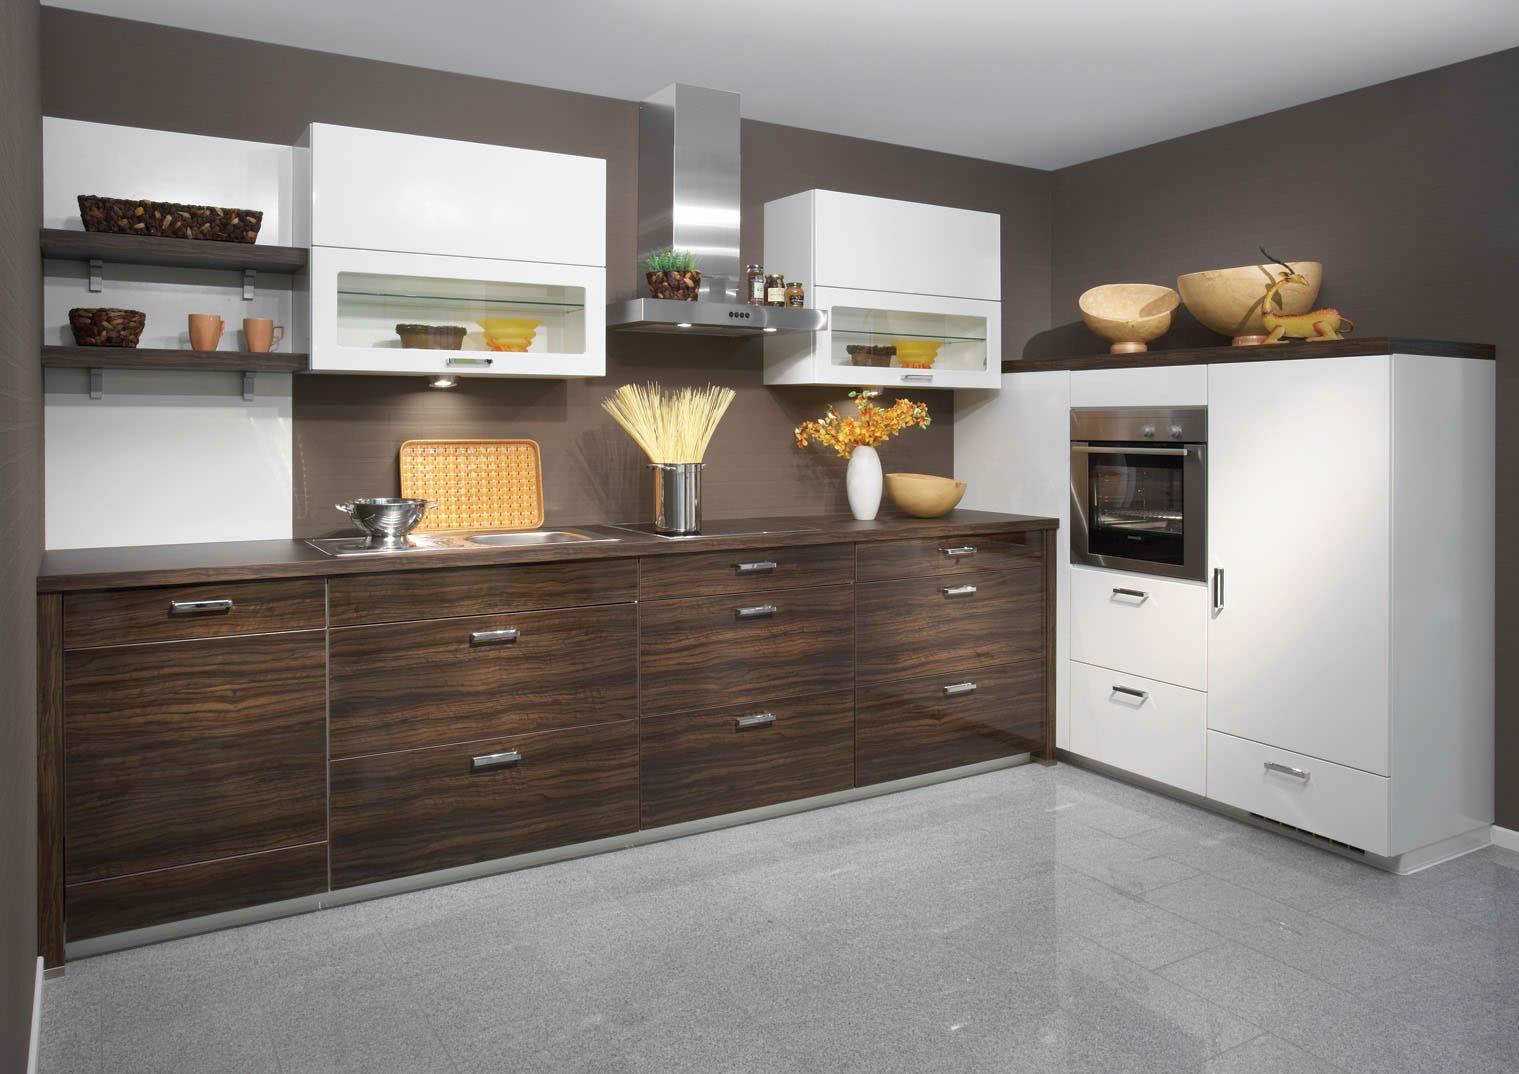 Uno white high gloss kitchen design interior exterior plan